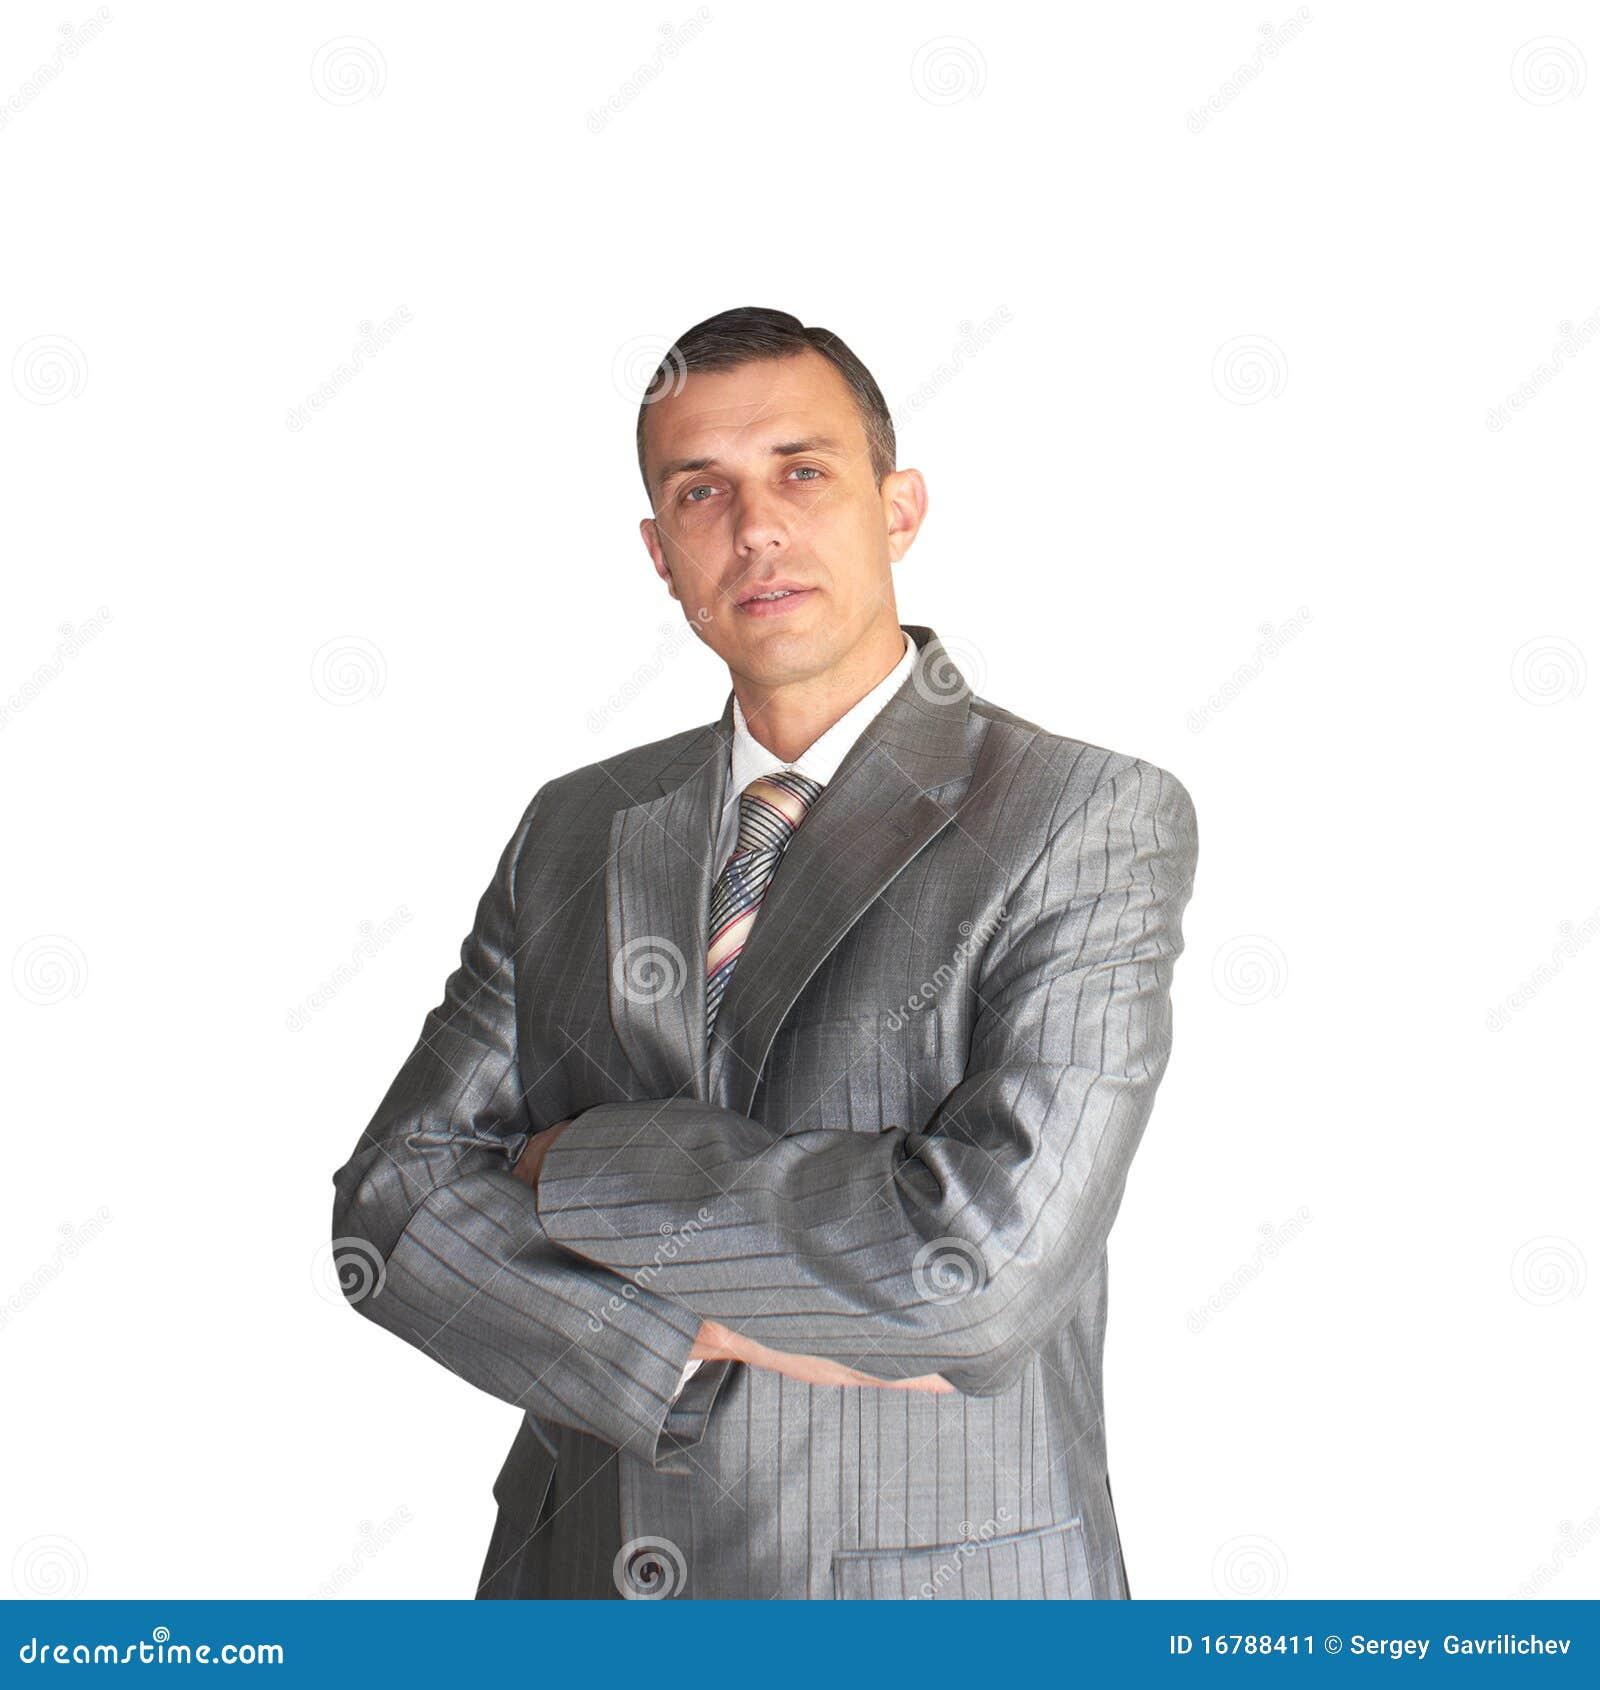 The modern businessman